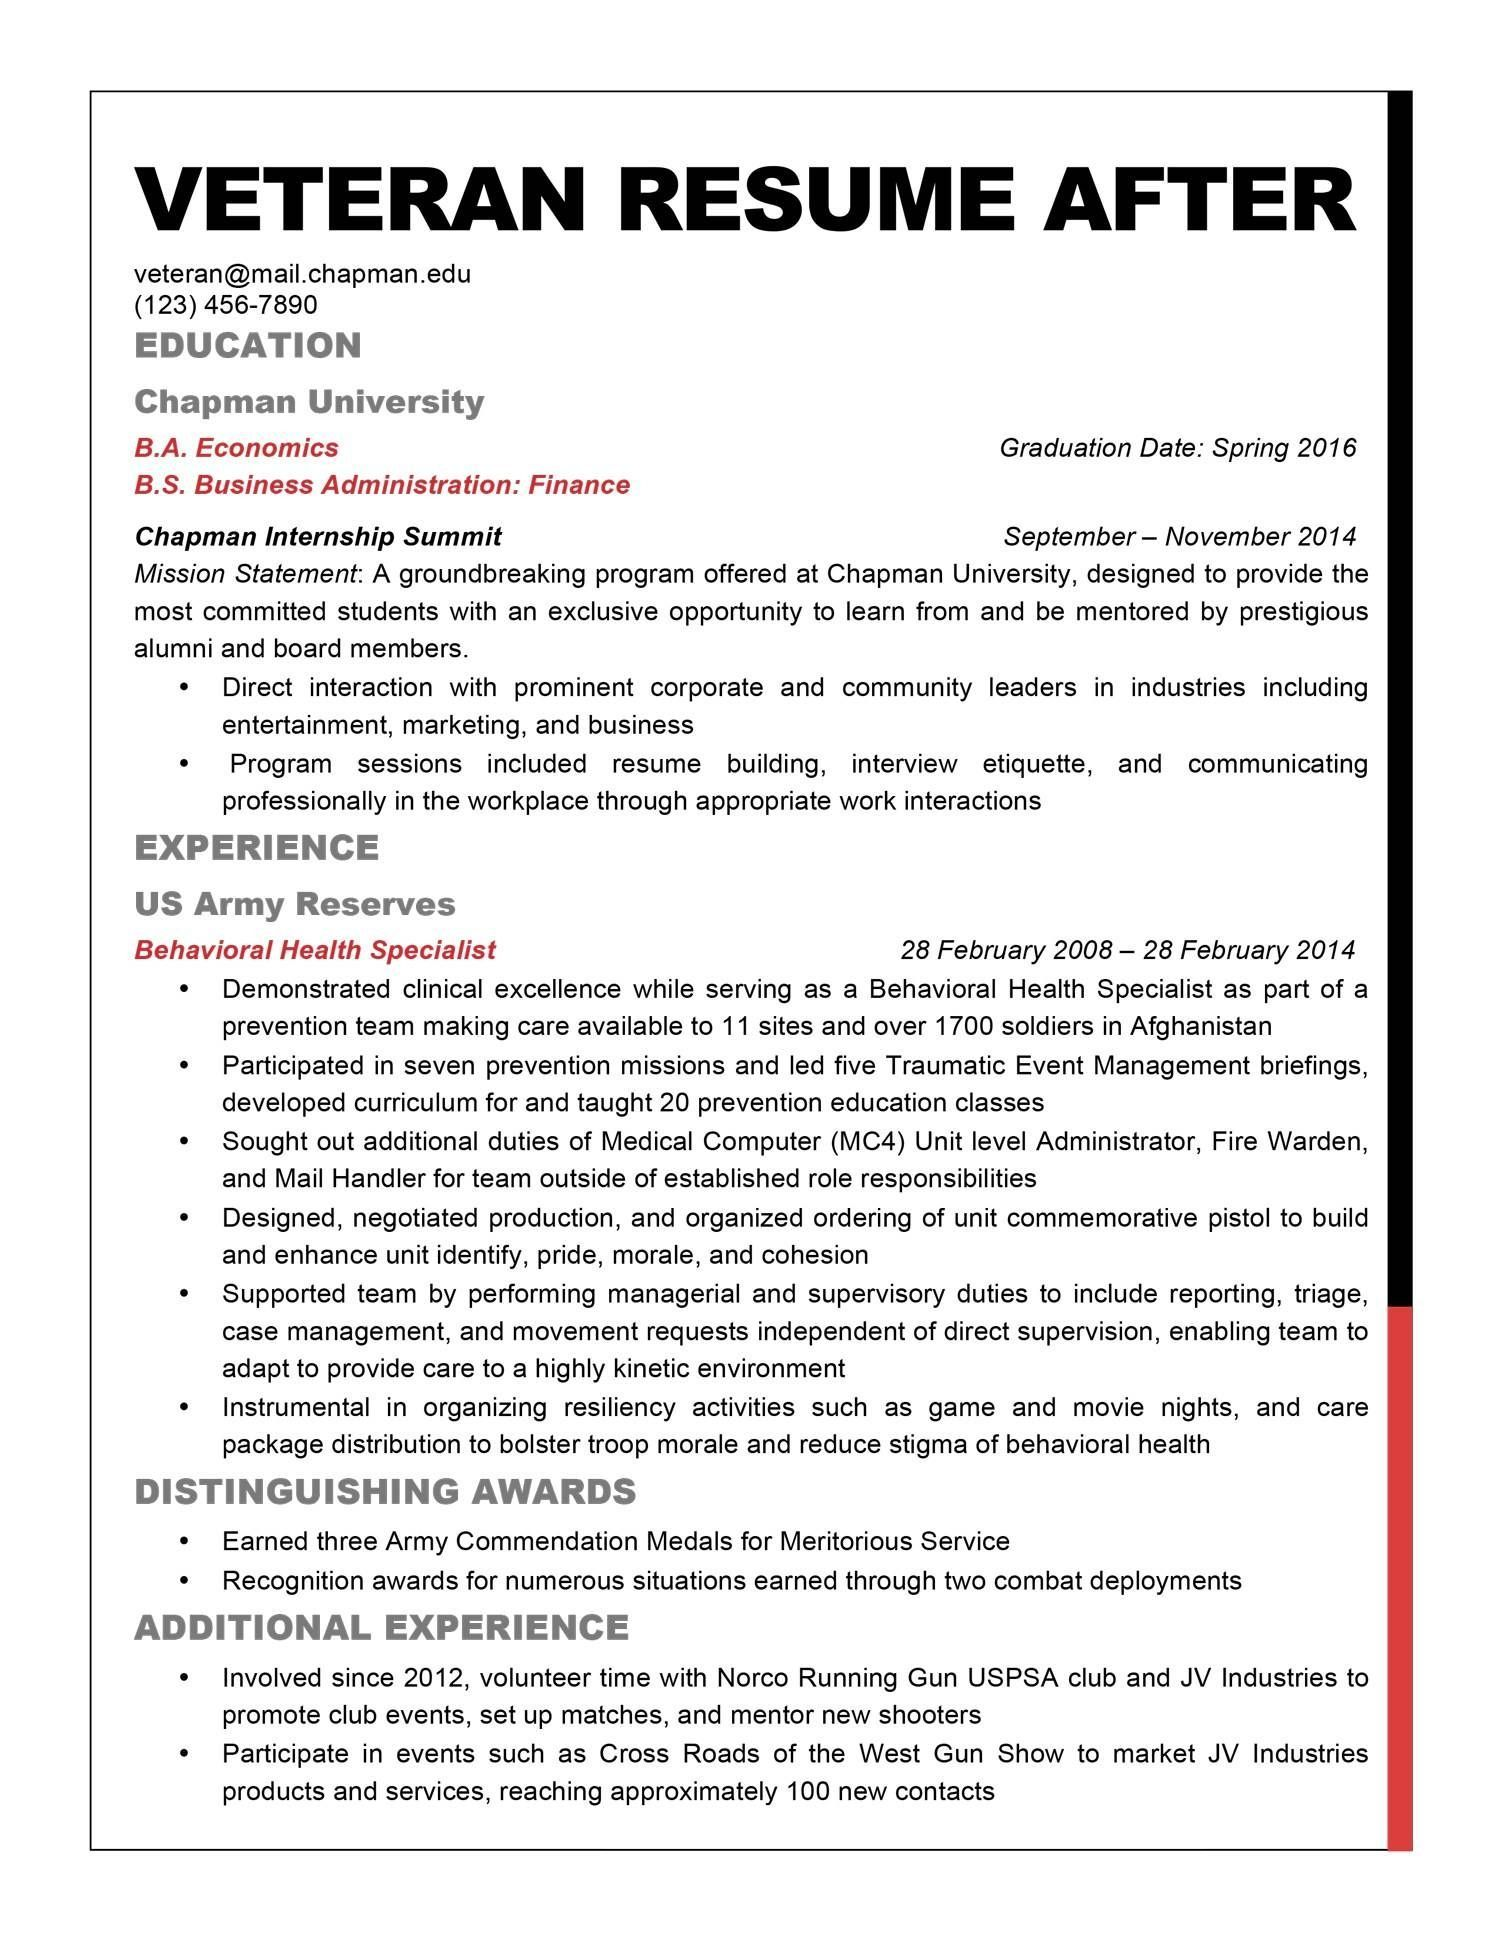 free resume templates for veterans freeresumetemplates resume